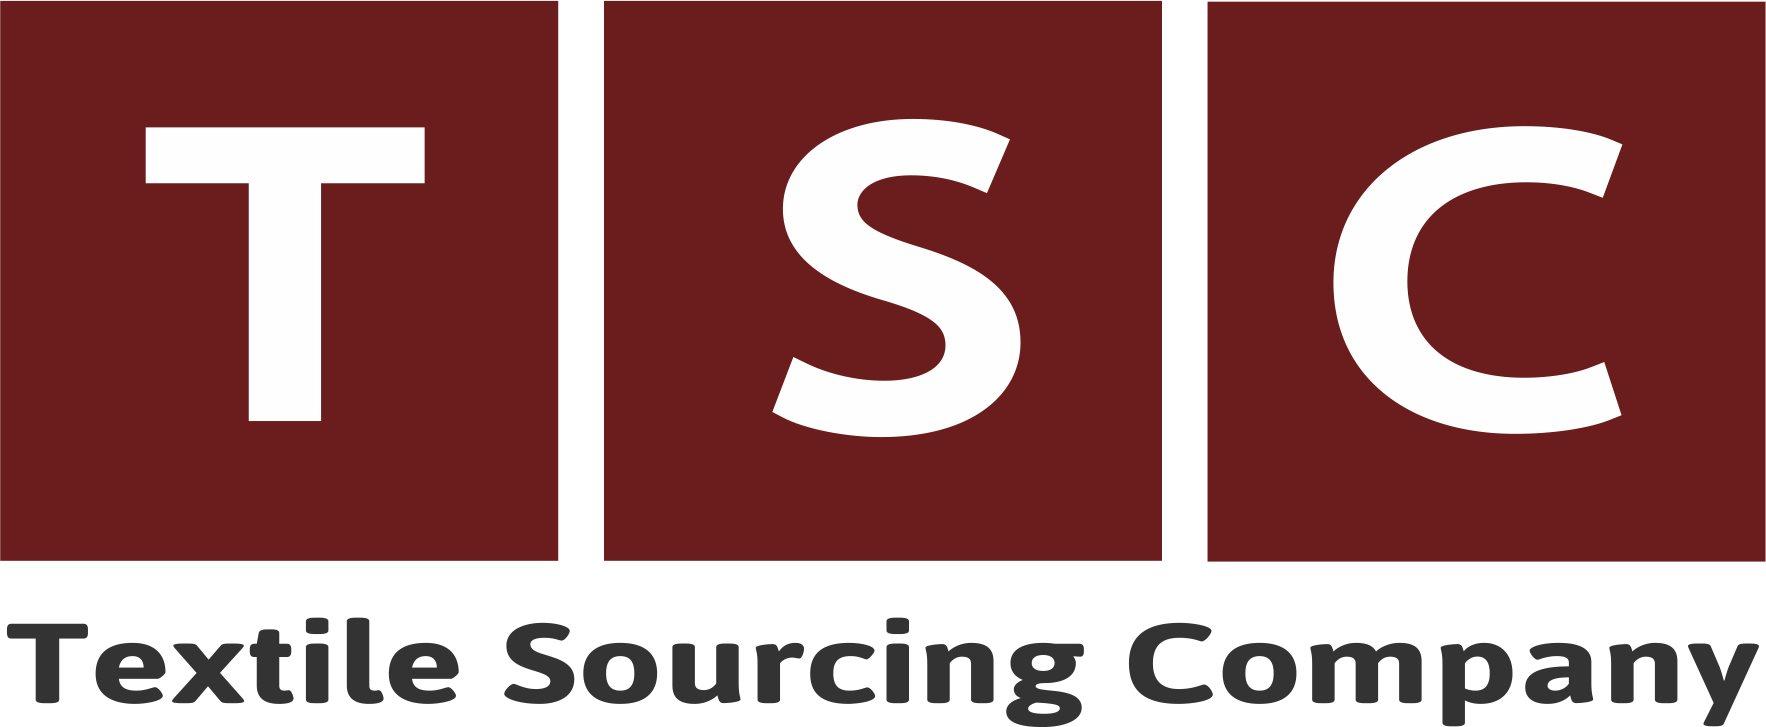 Textile Sourcing Company S.A.C